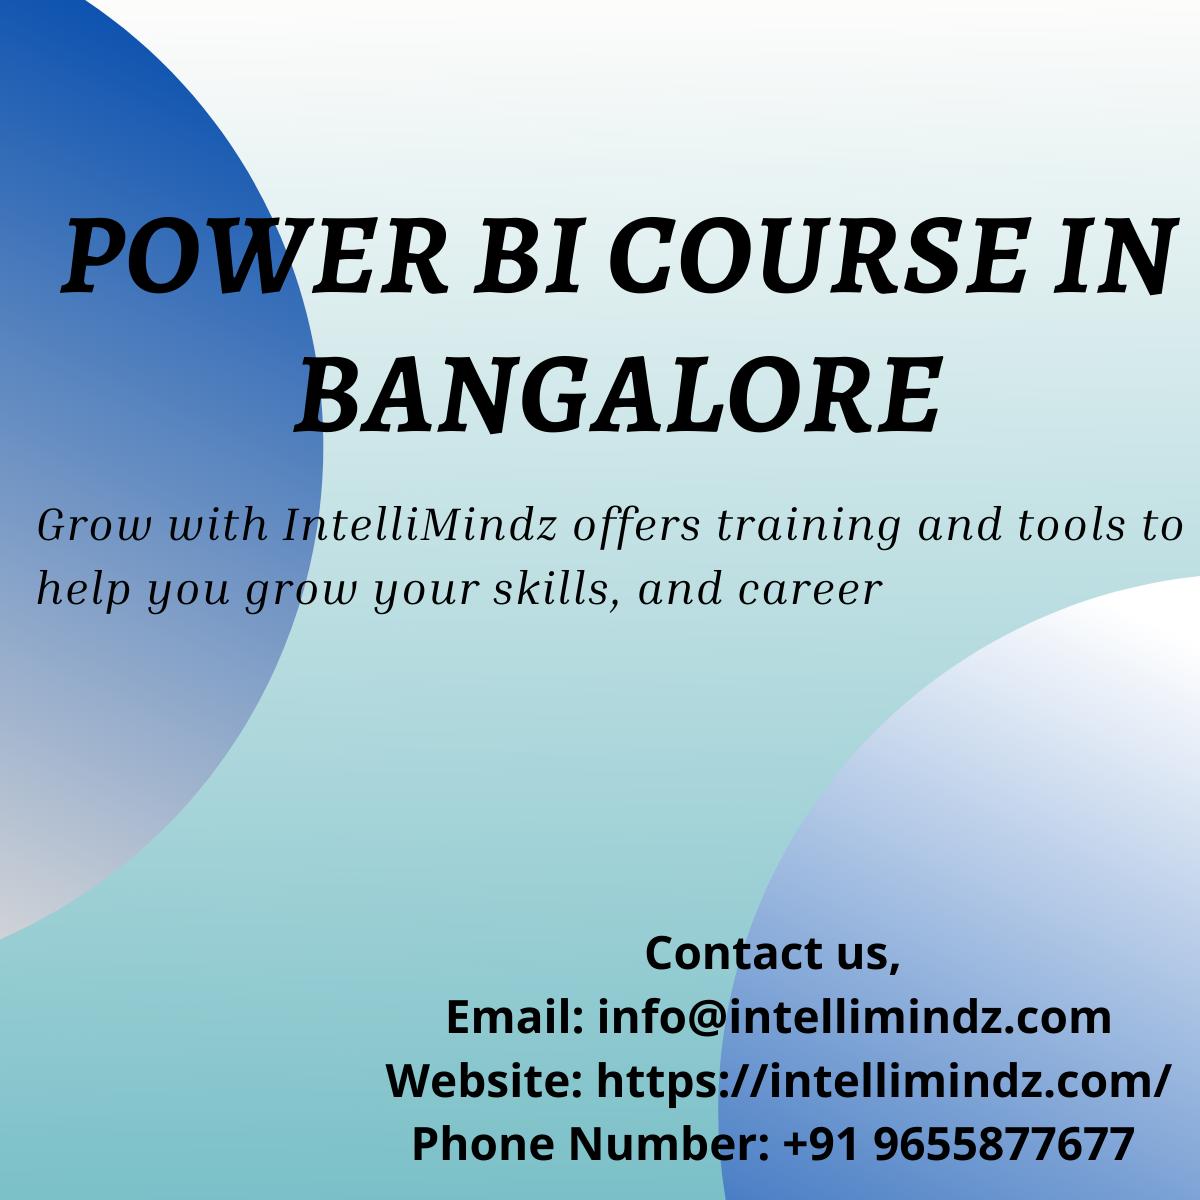 Power BI Course in Bangalore